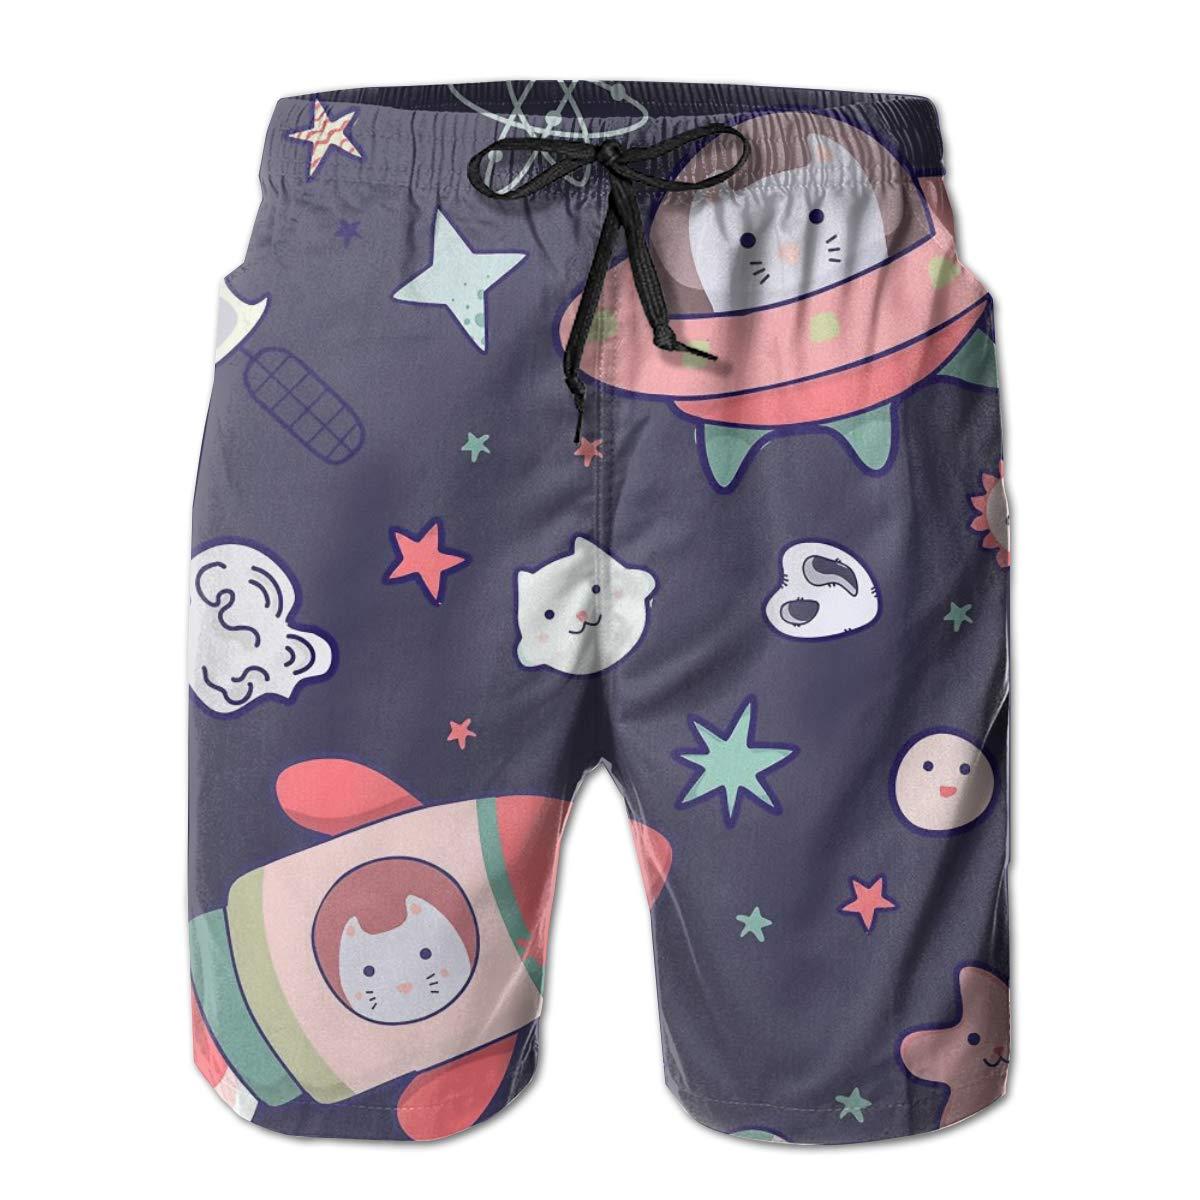 SARA NELL Mens Shorts Japanese Kawaii Cat Travels in Space UFO Rocket Quick Dry Swim Trunks Beach Board Shorts